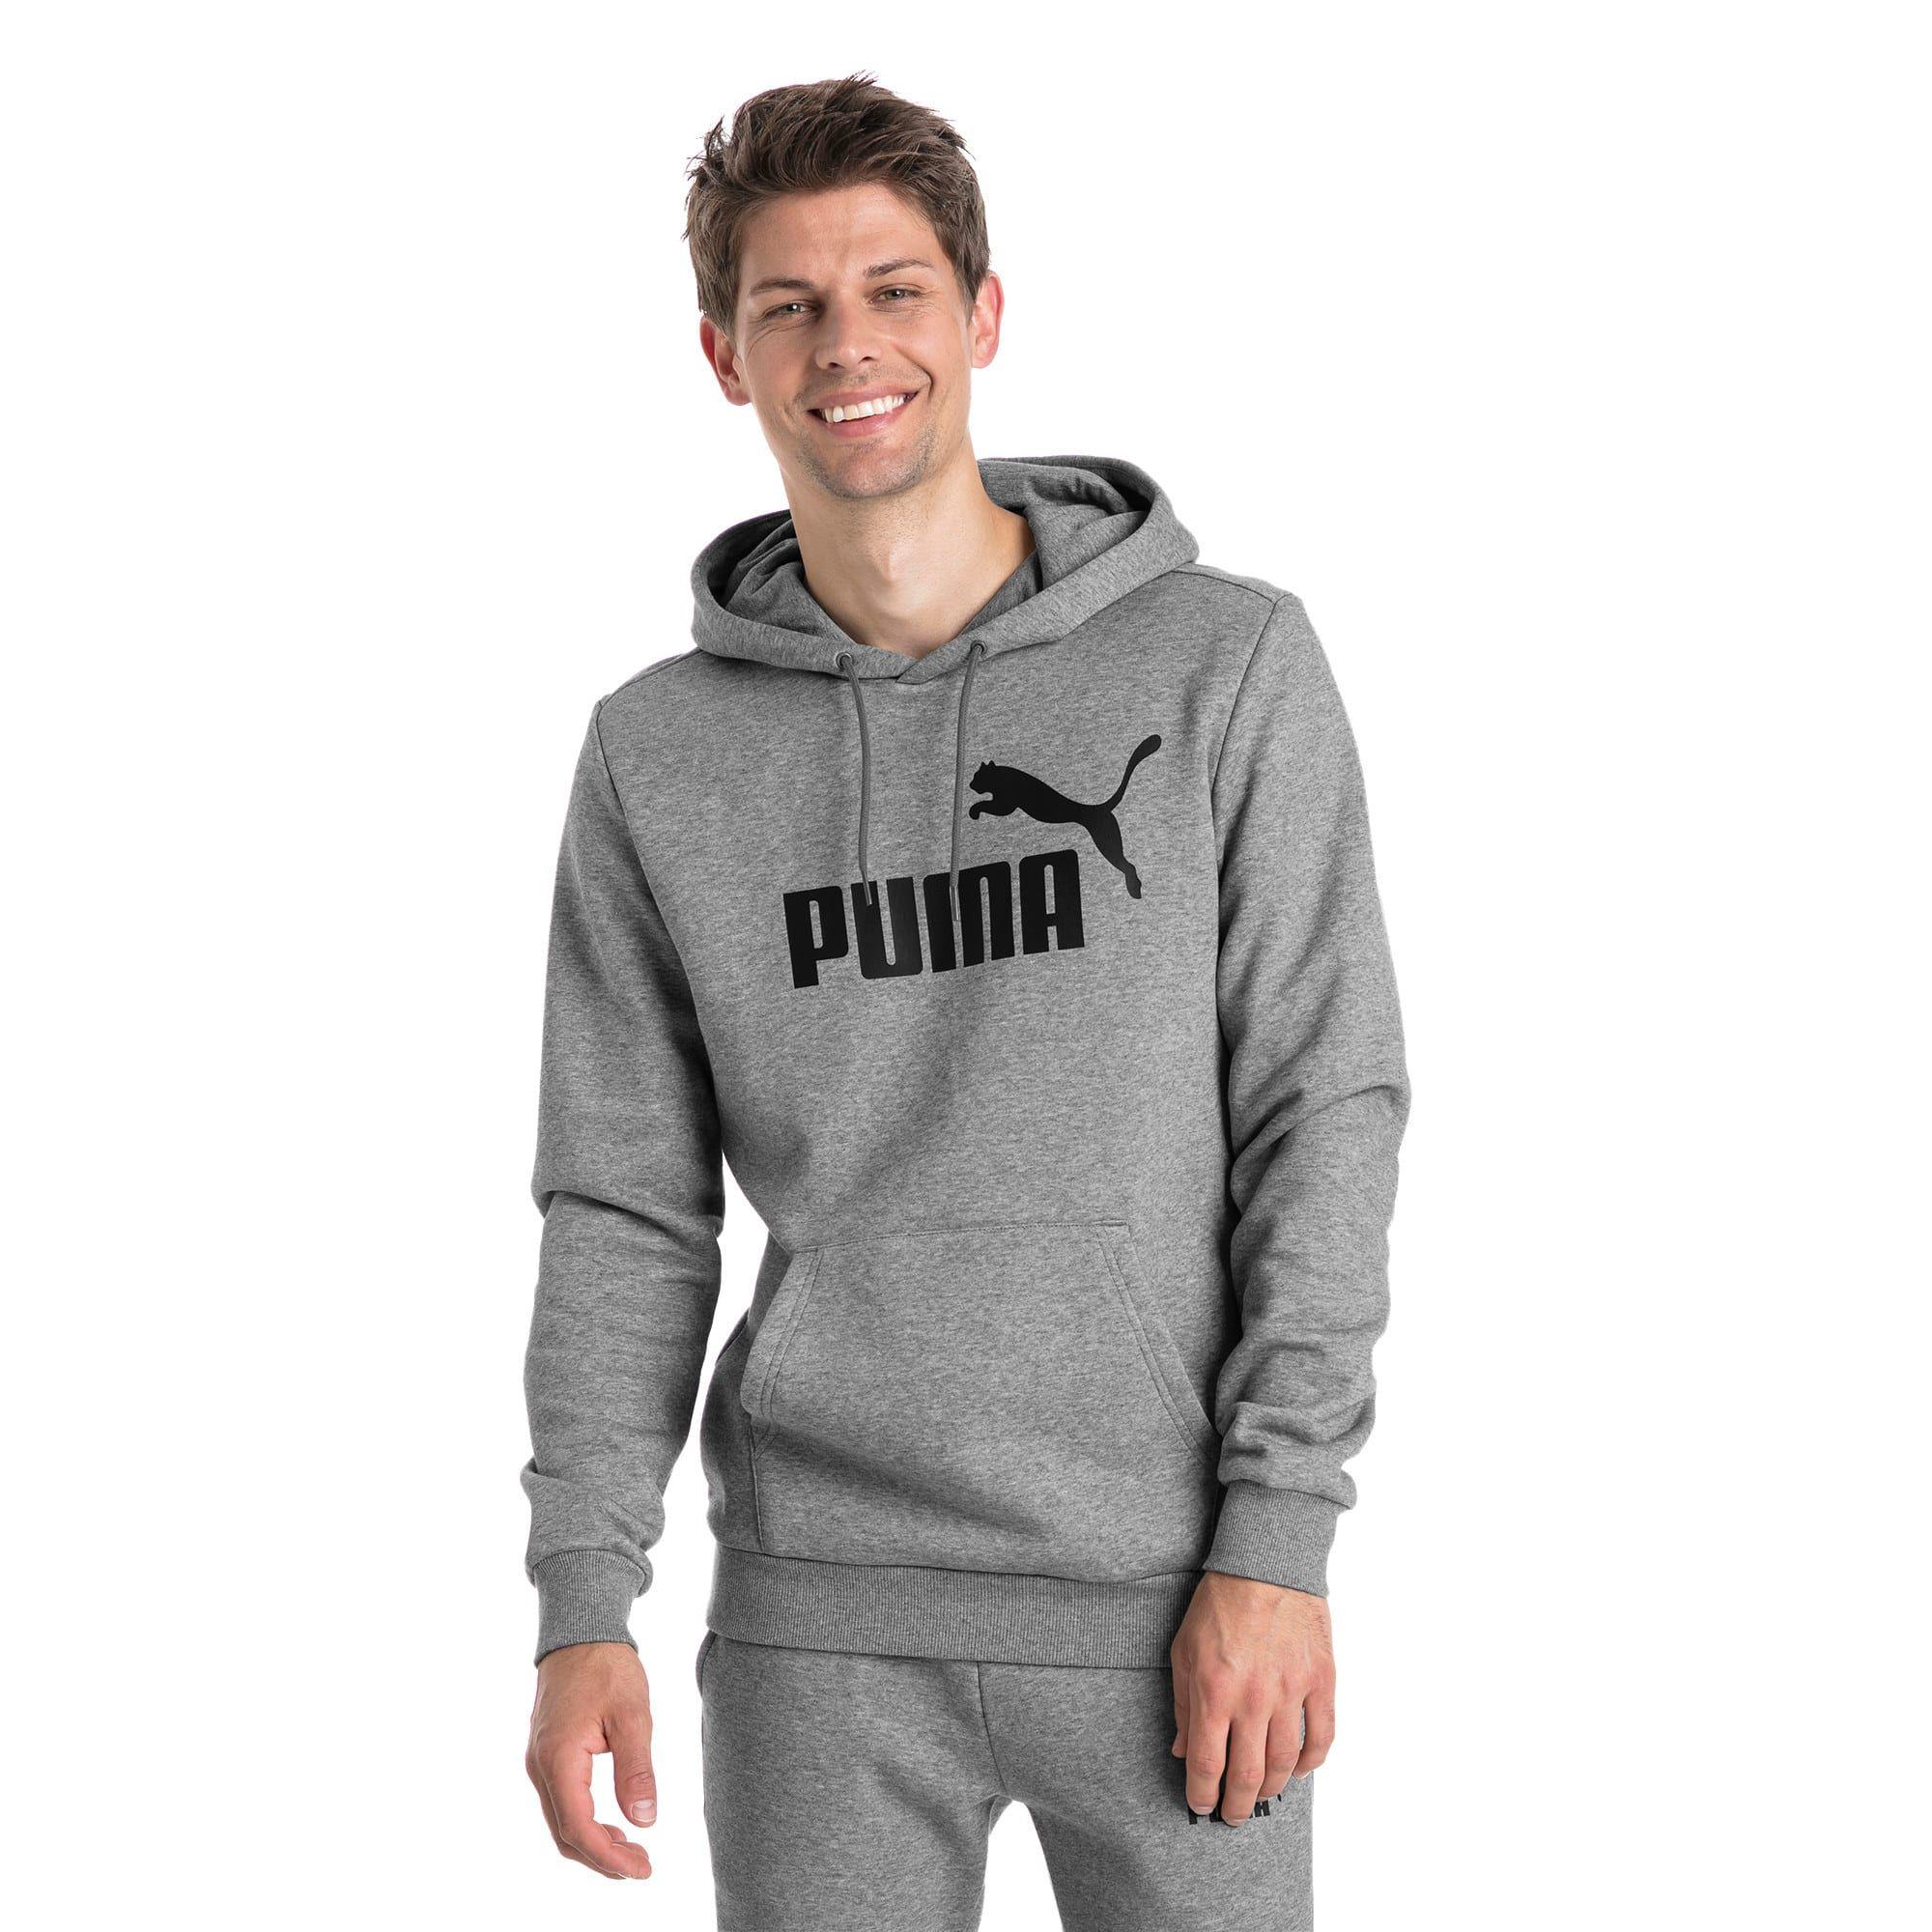 Photo of PUMA Essentials Fleece Men's Hoodie, Medium Grey Heather, size Large, Clothing